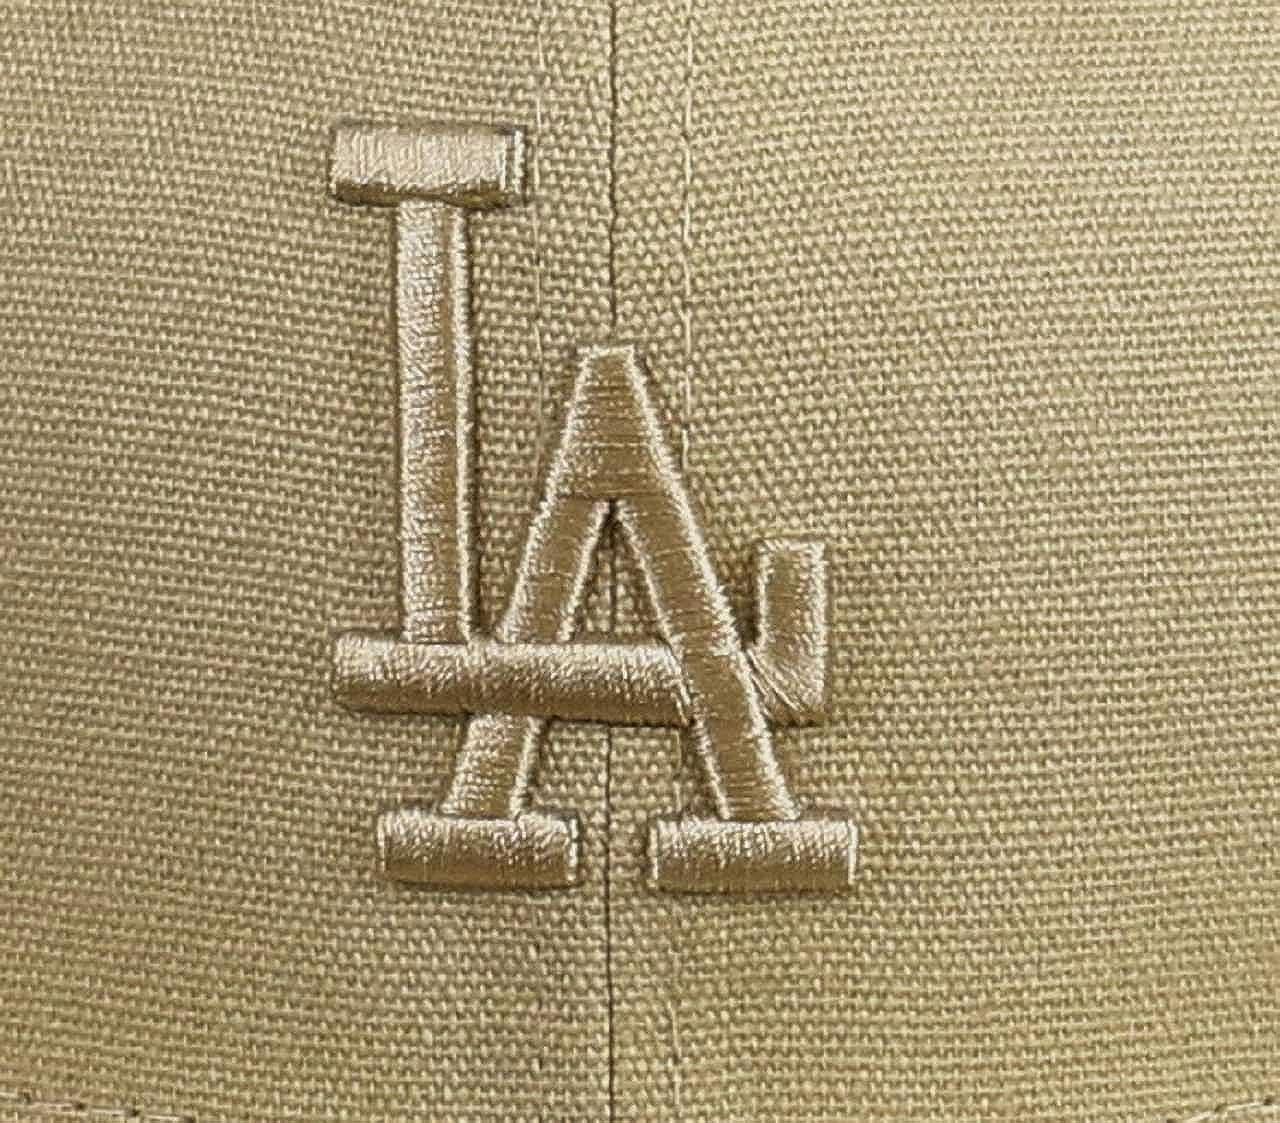 /Casquette Ligne Los Angeles Dodgers Mixte Adulte Canvas New Era 9/Fifty Losdod/